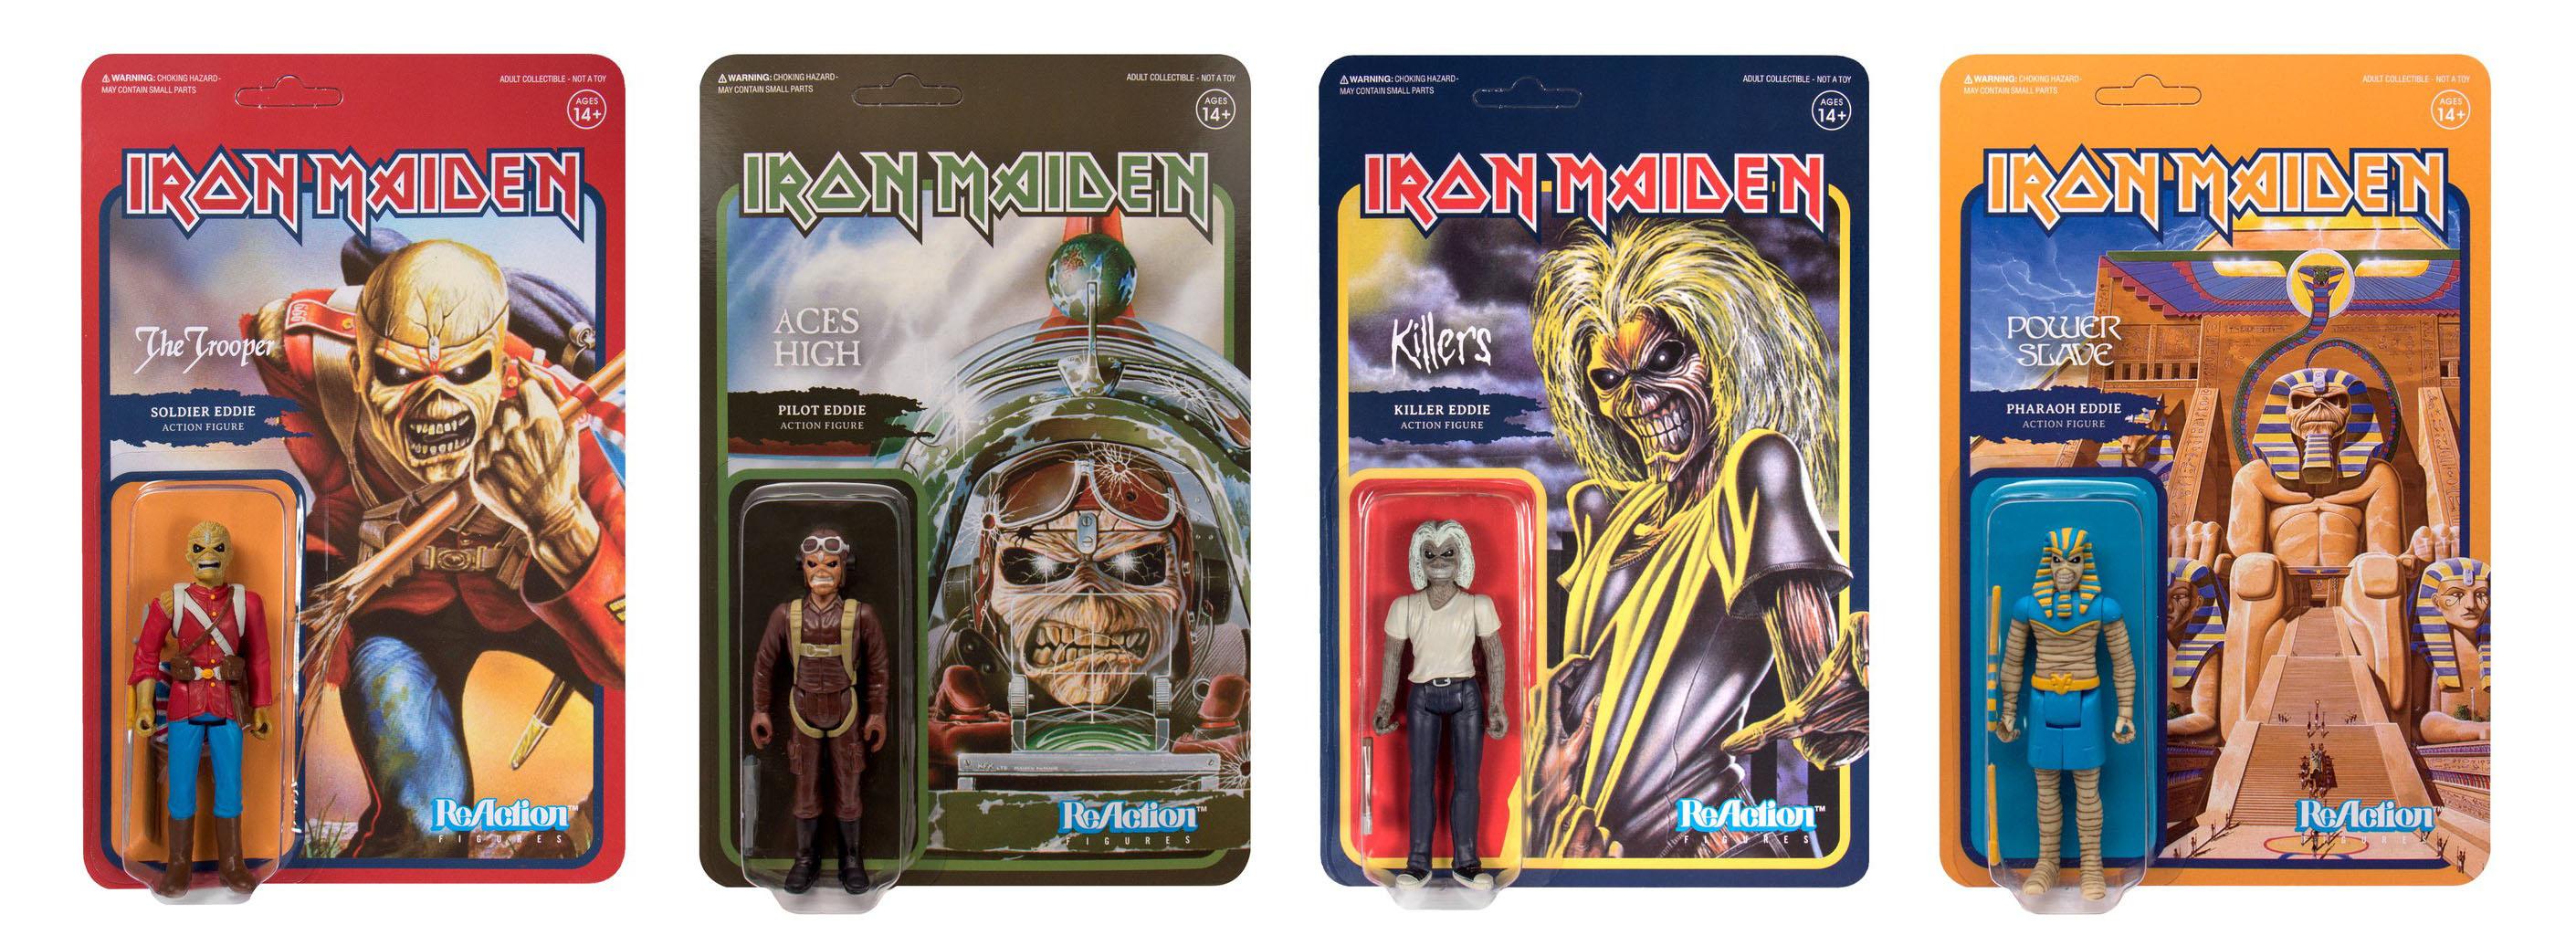 Iron Maiden ReAction Figures Available Now The Toyark News